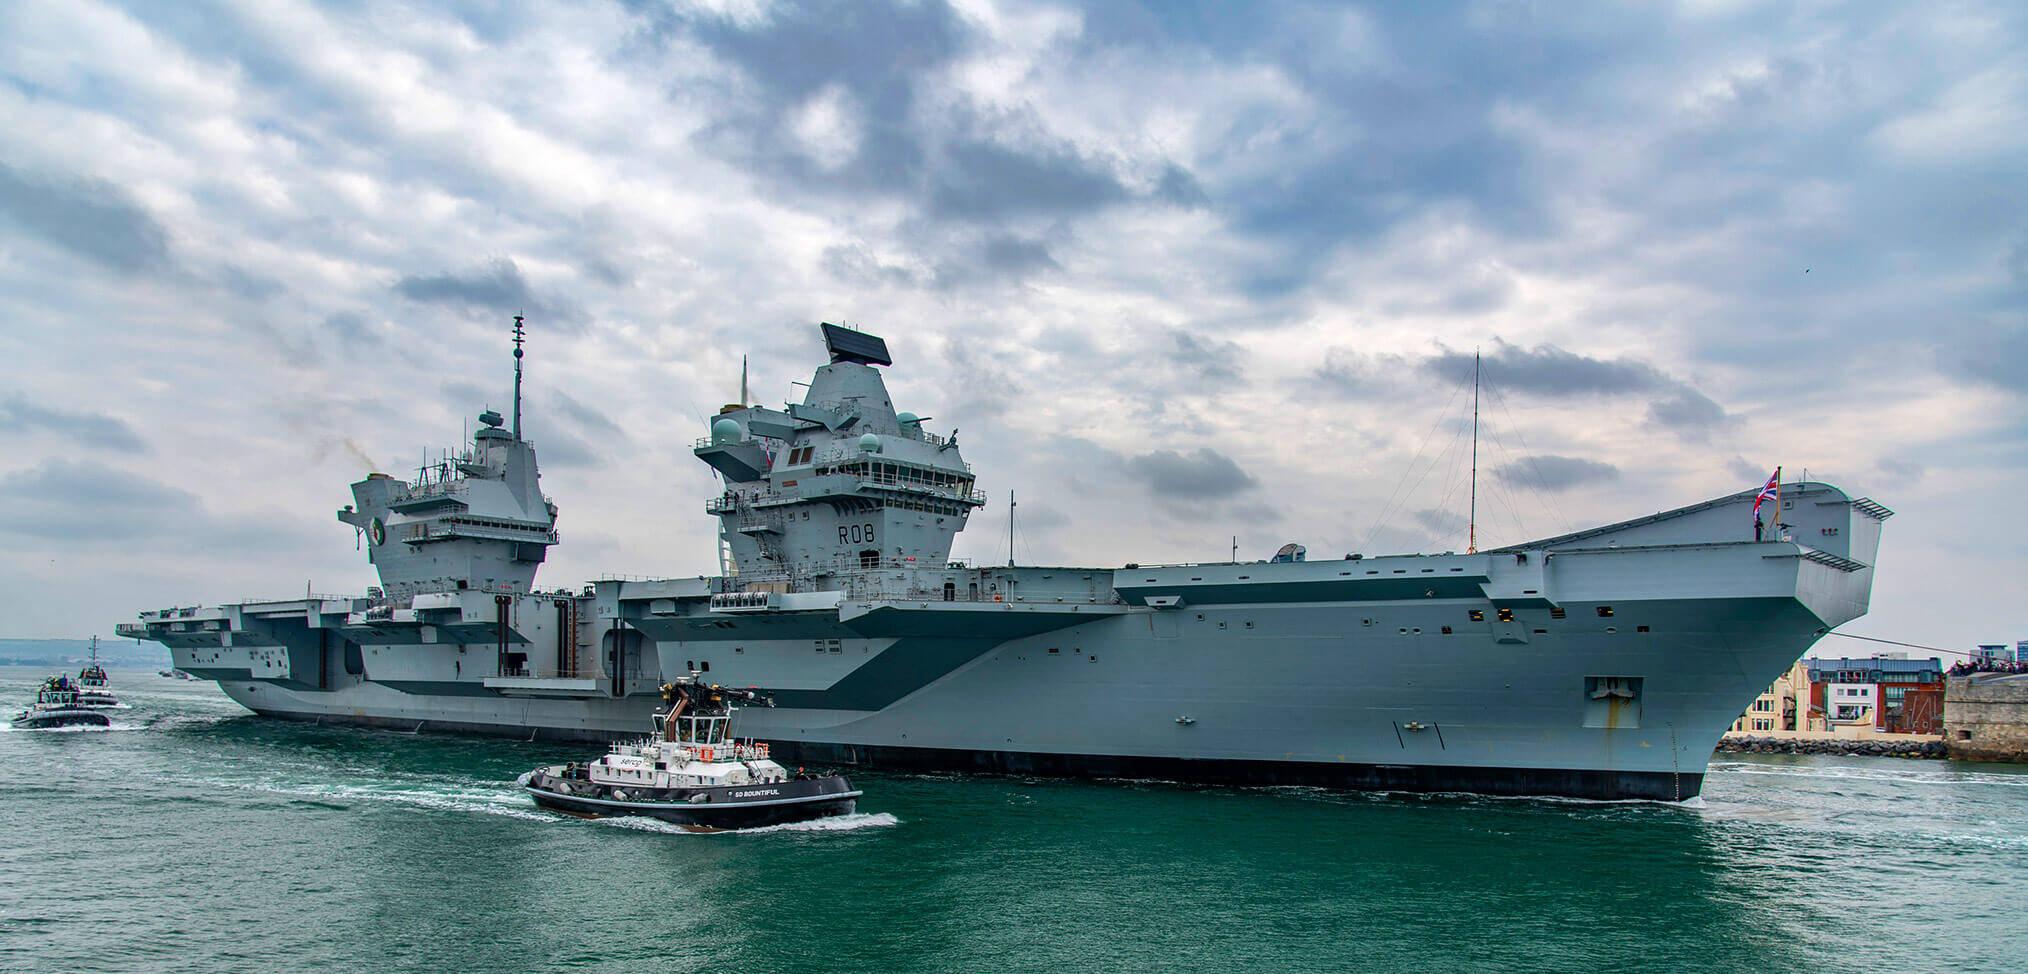 HMS Queen Elizabeth sails for part II helicopter trials